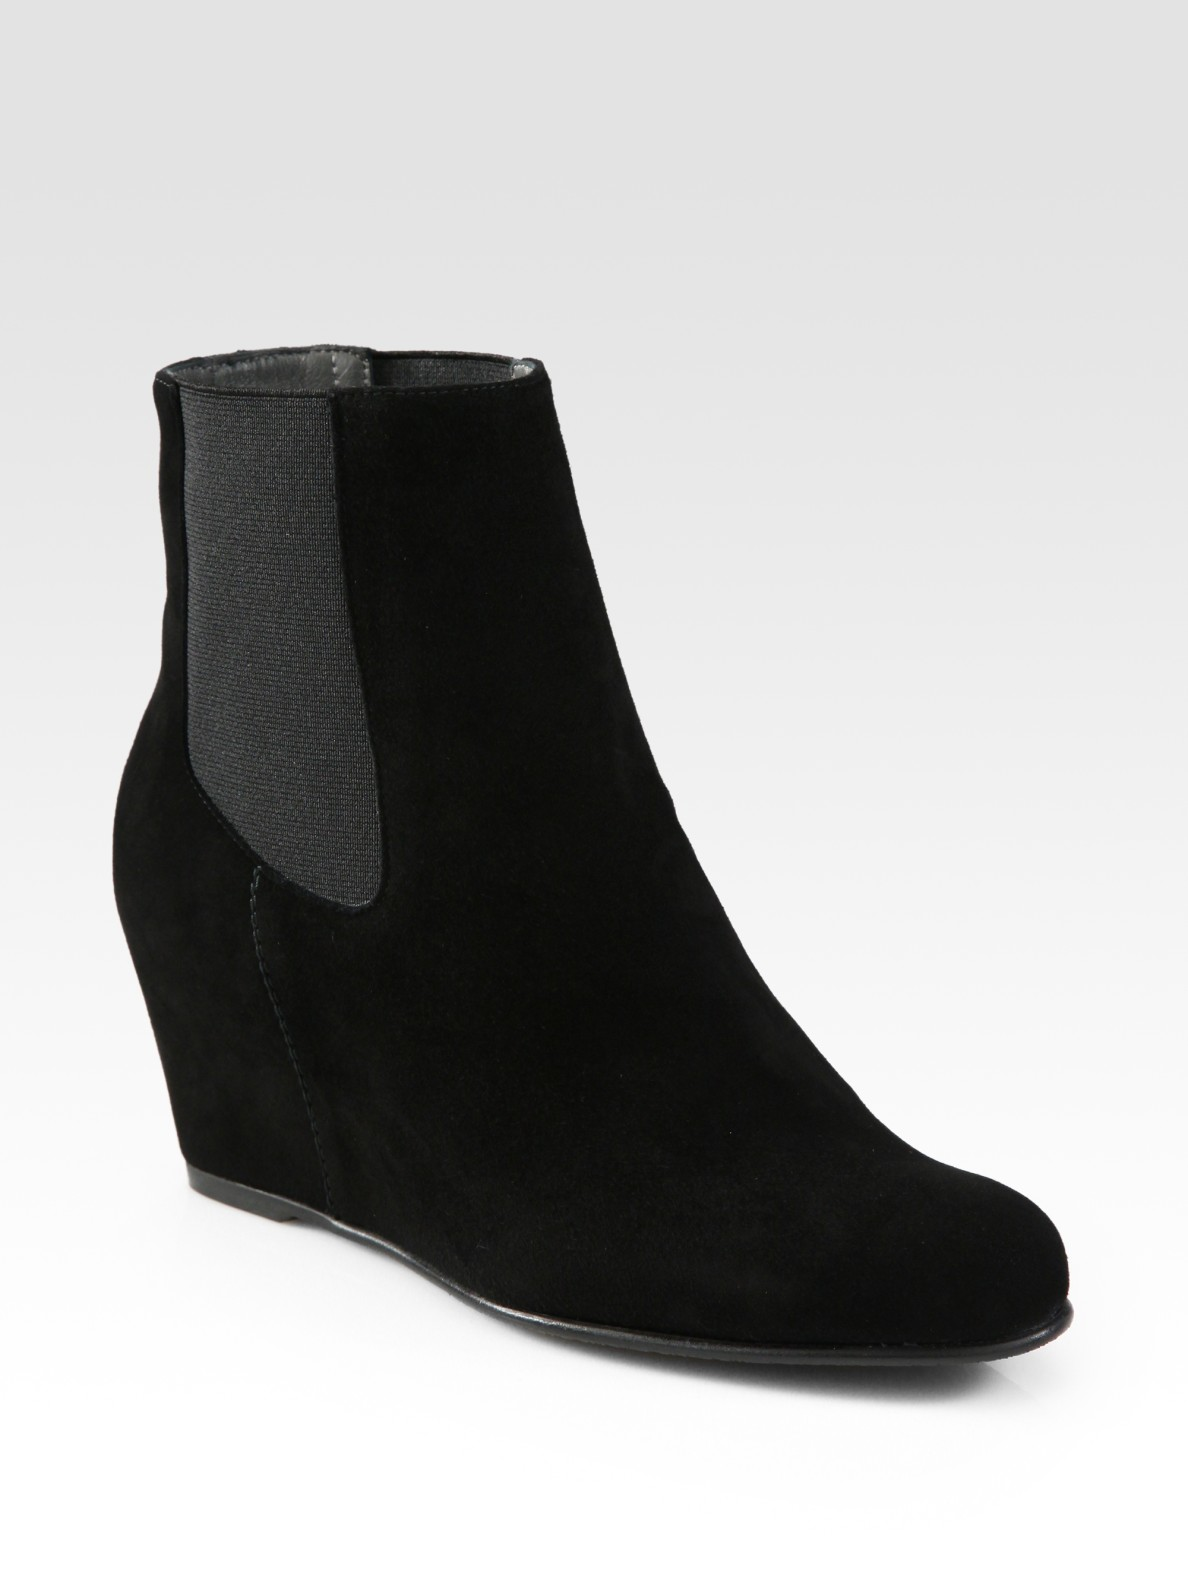 stuart weitzman socks suede wedge ankle boots in black lyst